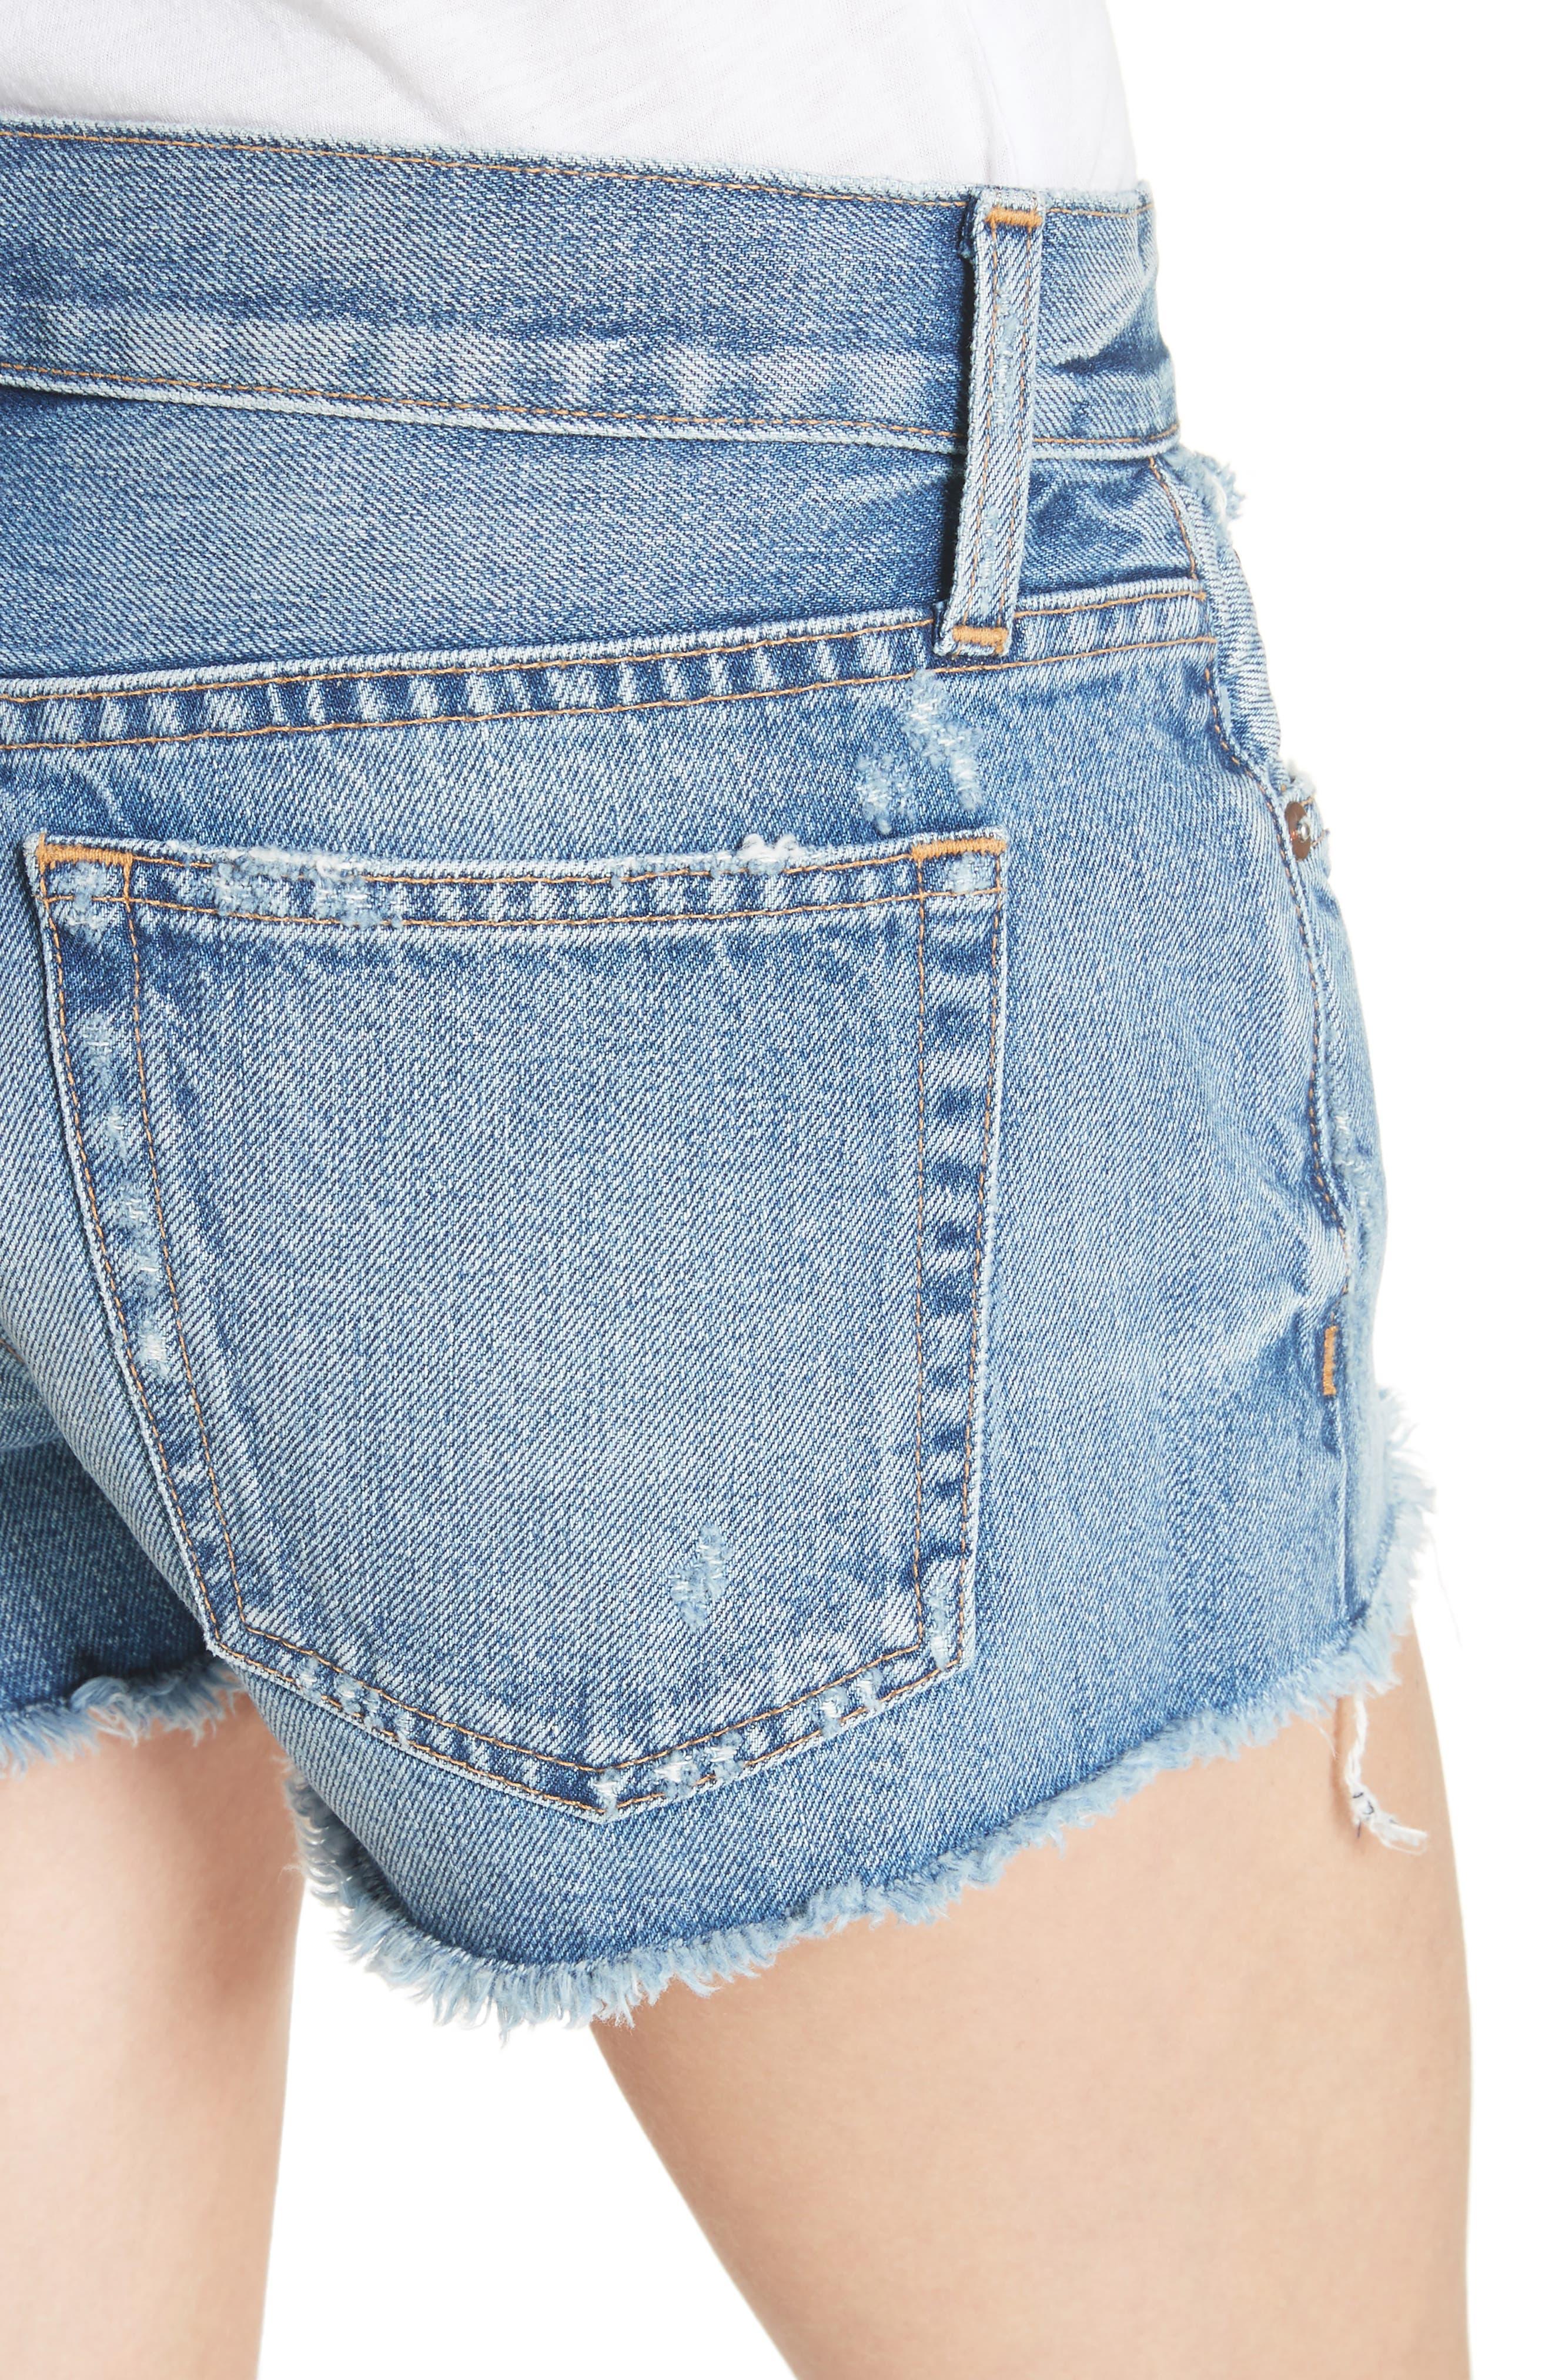 AO.LA Amazing Vintage Denim Shorts,                             Alternate thumbnail 4, color,                             415